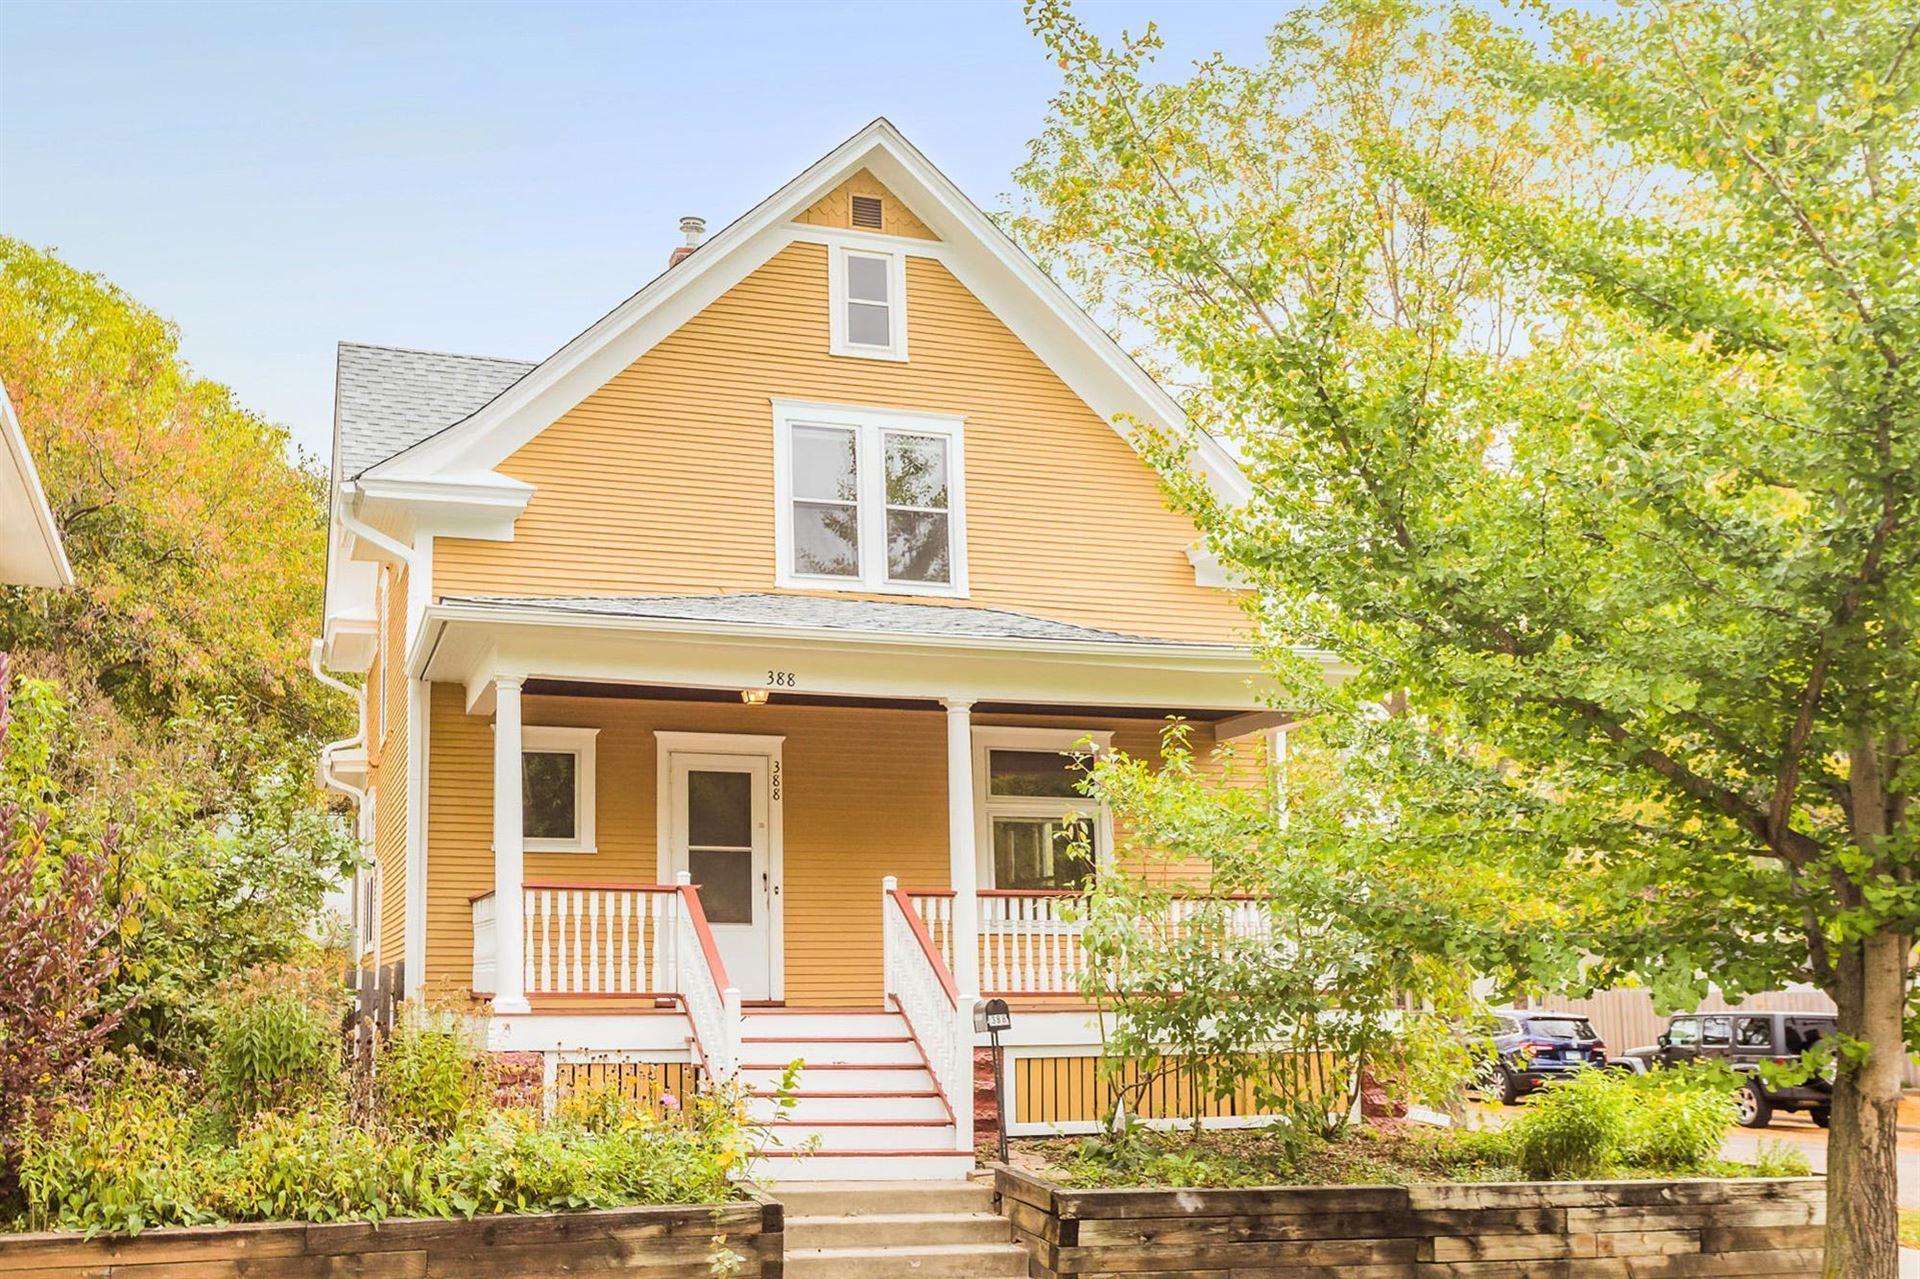 388 Hamline Avenue S, Saint Paul, MN 55105 - MLS#: 5649834